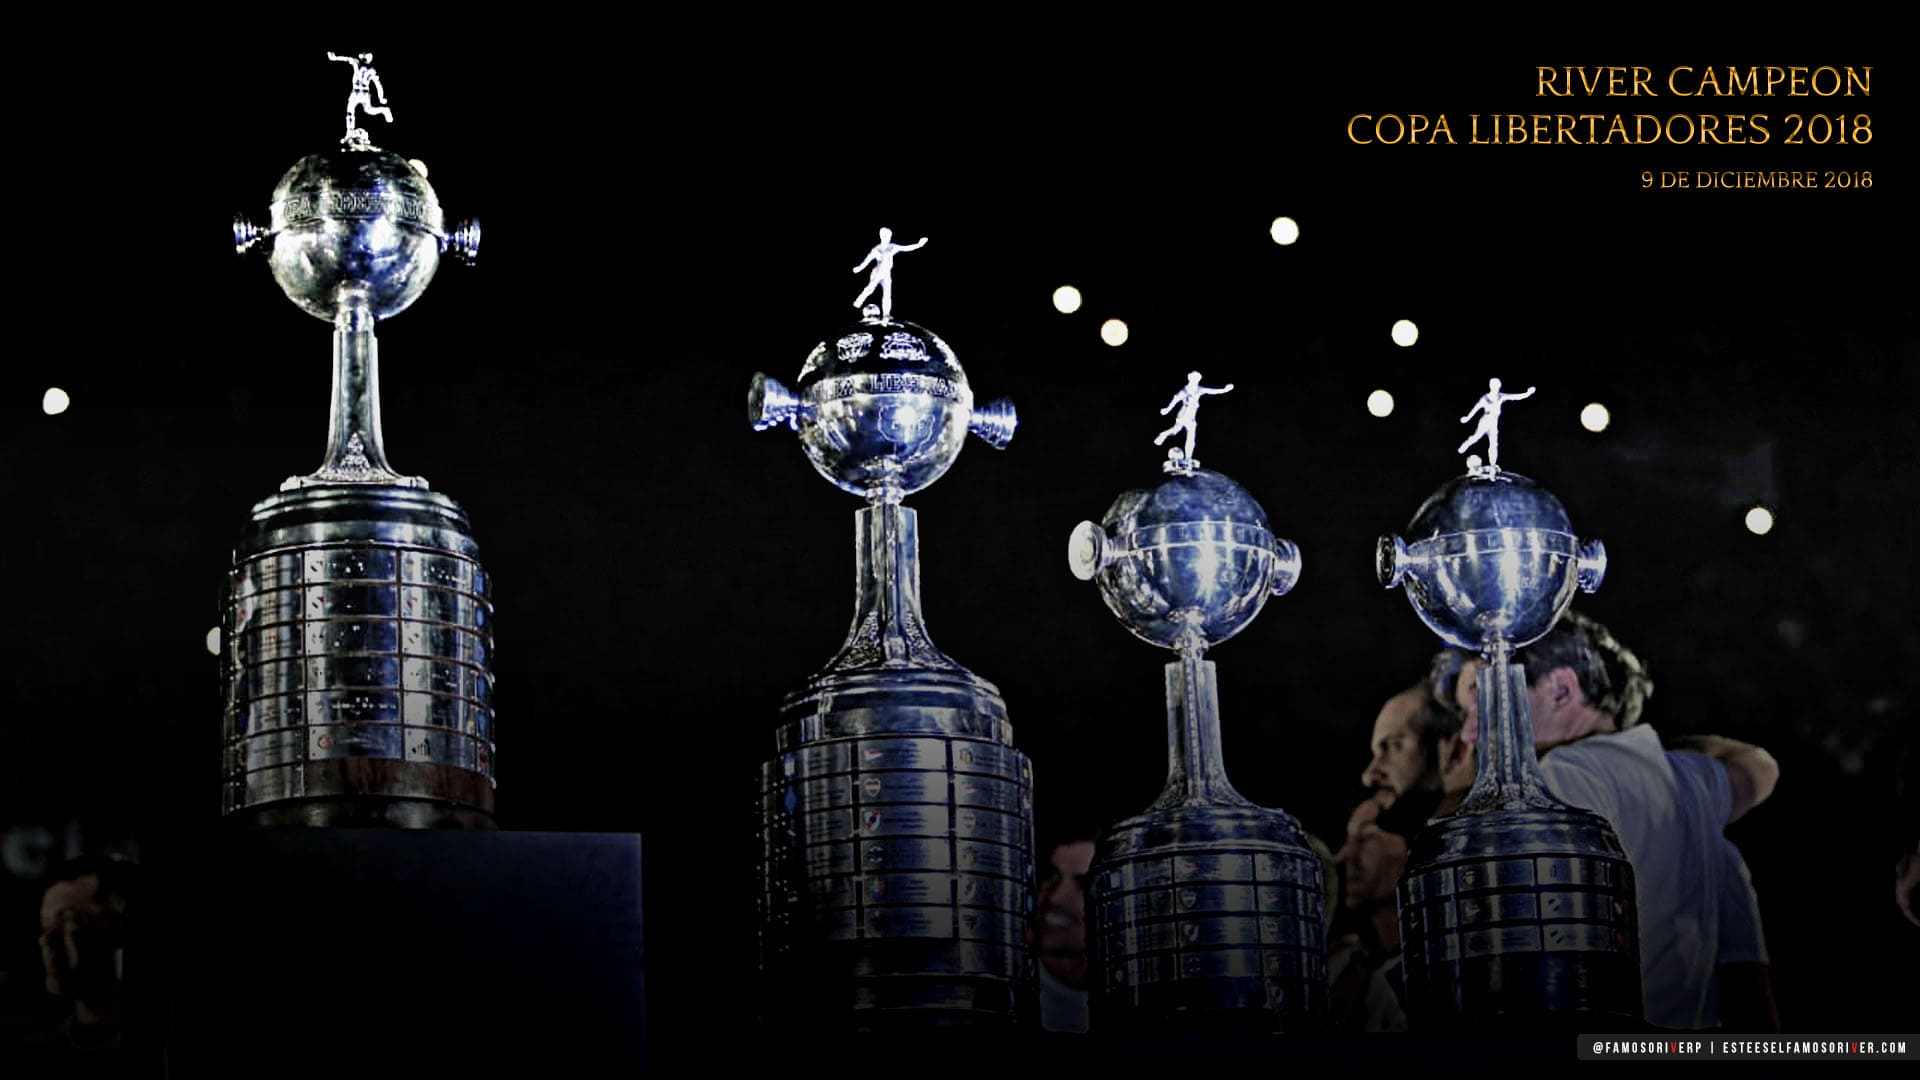 imagenes-de-river-plate-para-fondos-de-pantalla-wallpaper-de-river-campeon copa libertadores 2018 cuarta copa libertadores festejos en el monumental